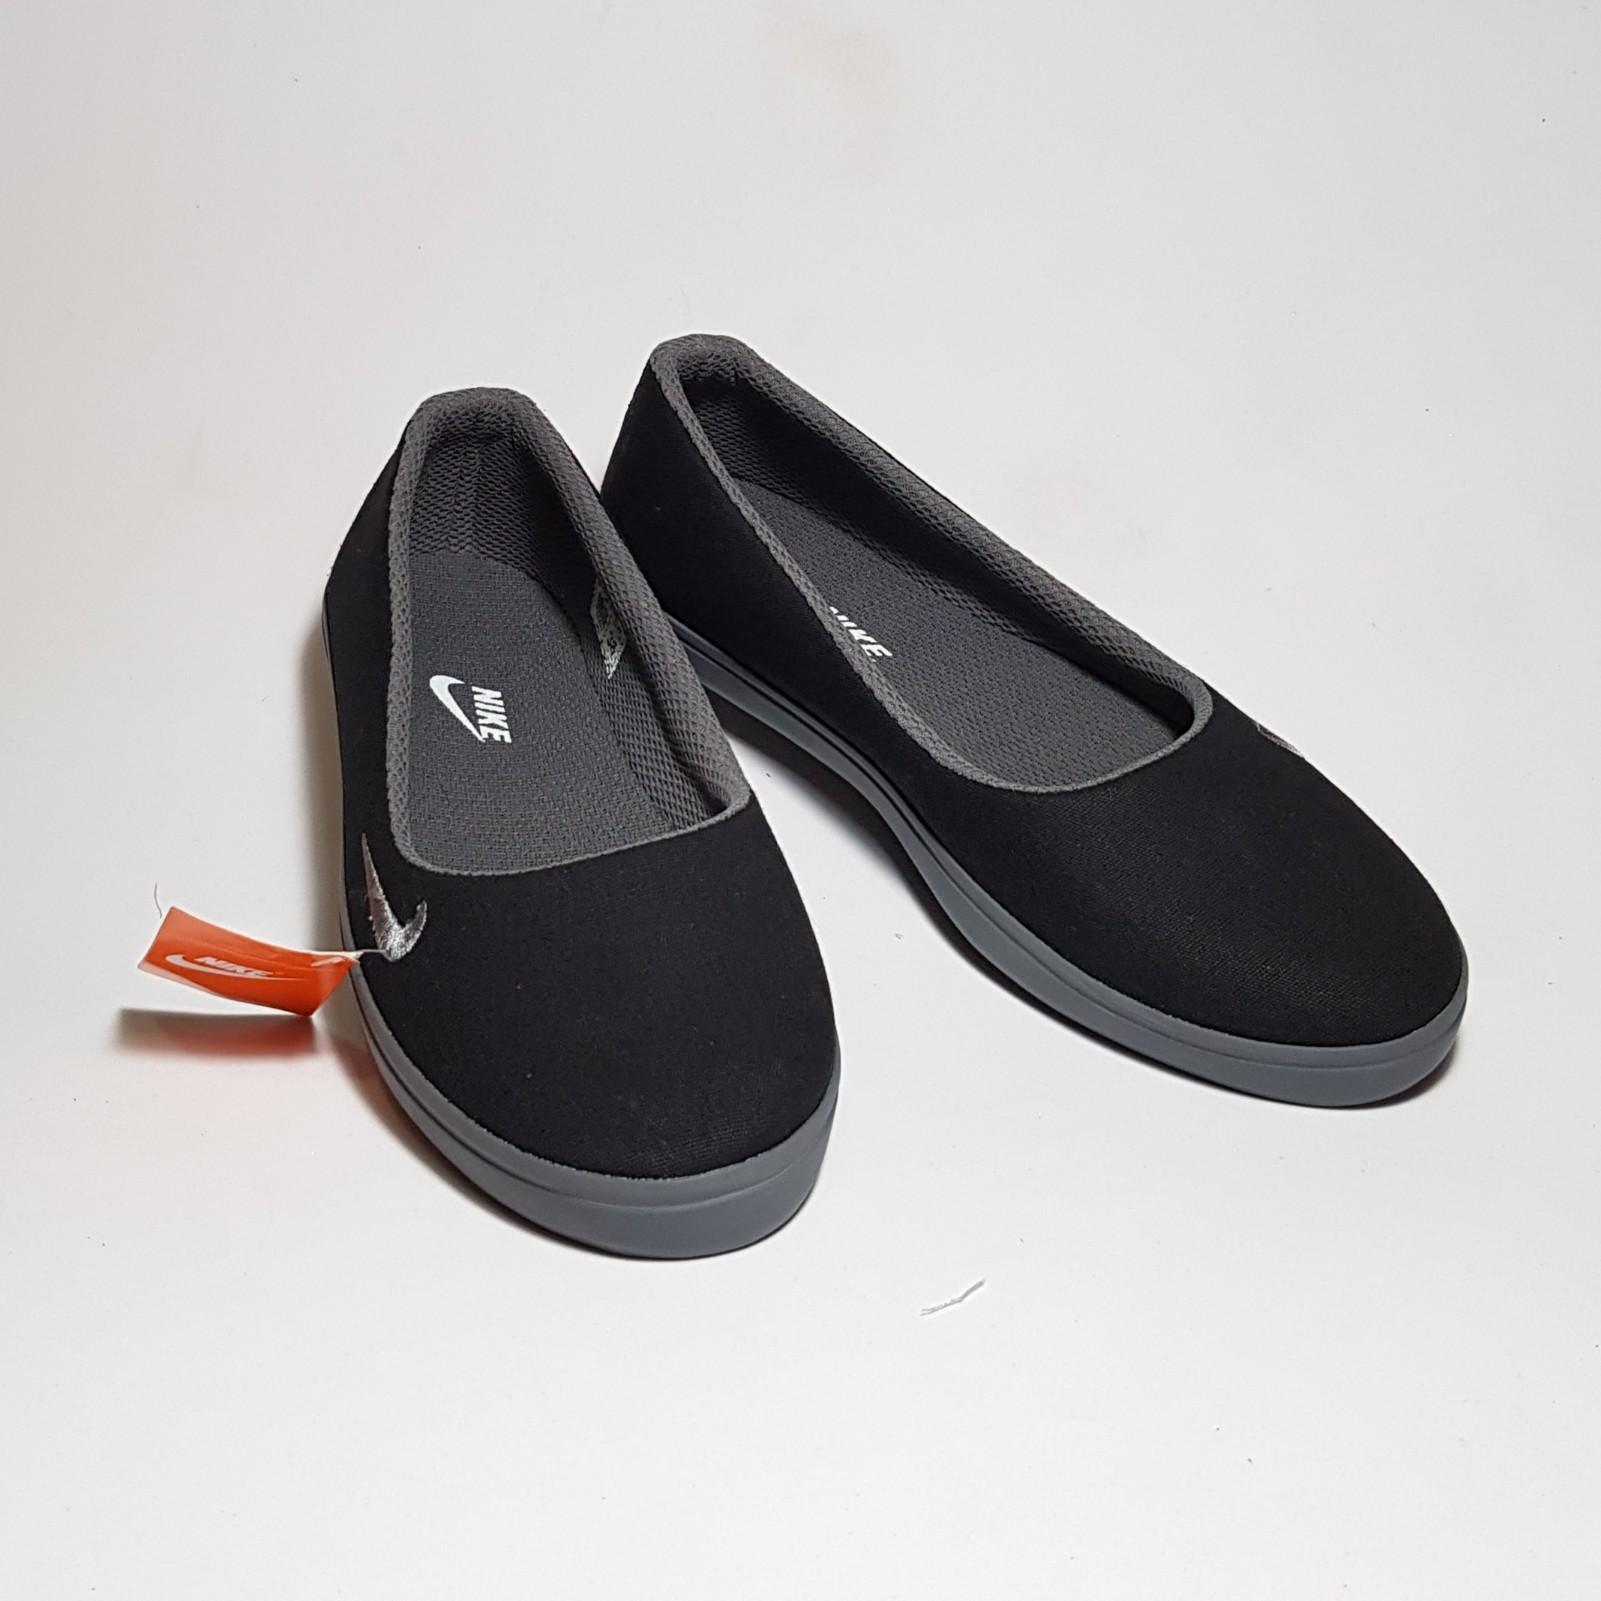 Sepatu import wanita murah / Sepatu kerja wanita / Sepatu santai / Sepatu slip on wanita / Sepatu flat wanita / Sepatu kanvas wanita / Sepatu / Sepatu import / Sepatu wanita / Sepatu cewek / Sepatu kerja wanita / Sepatu murah / Sepatu cewek murah